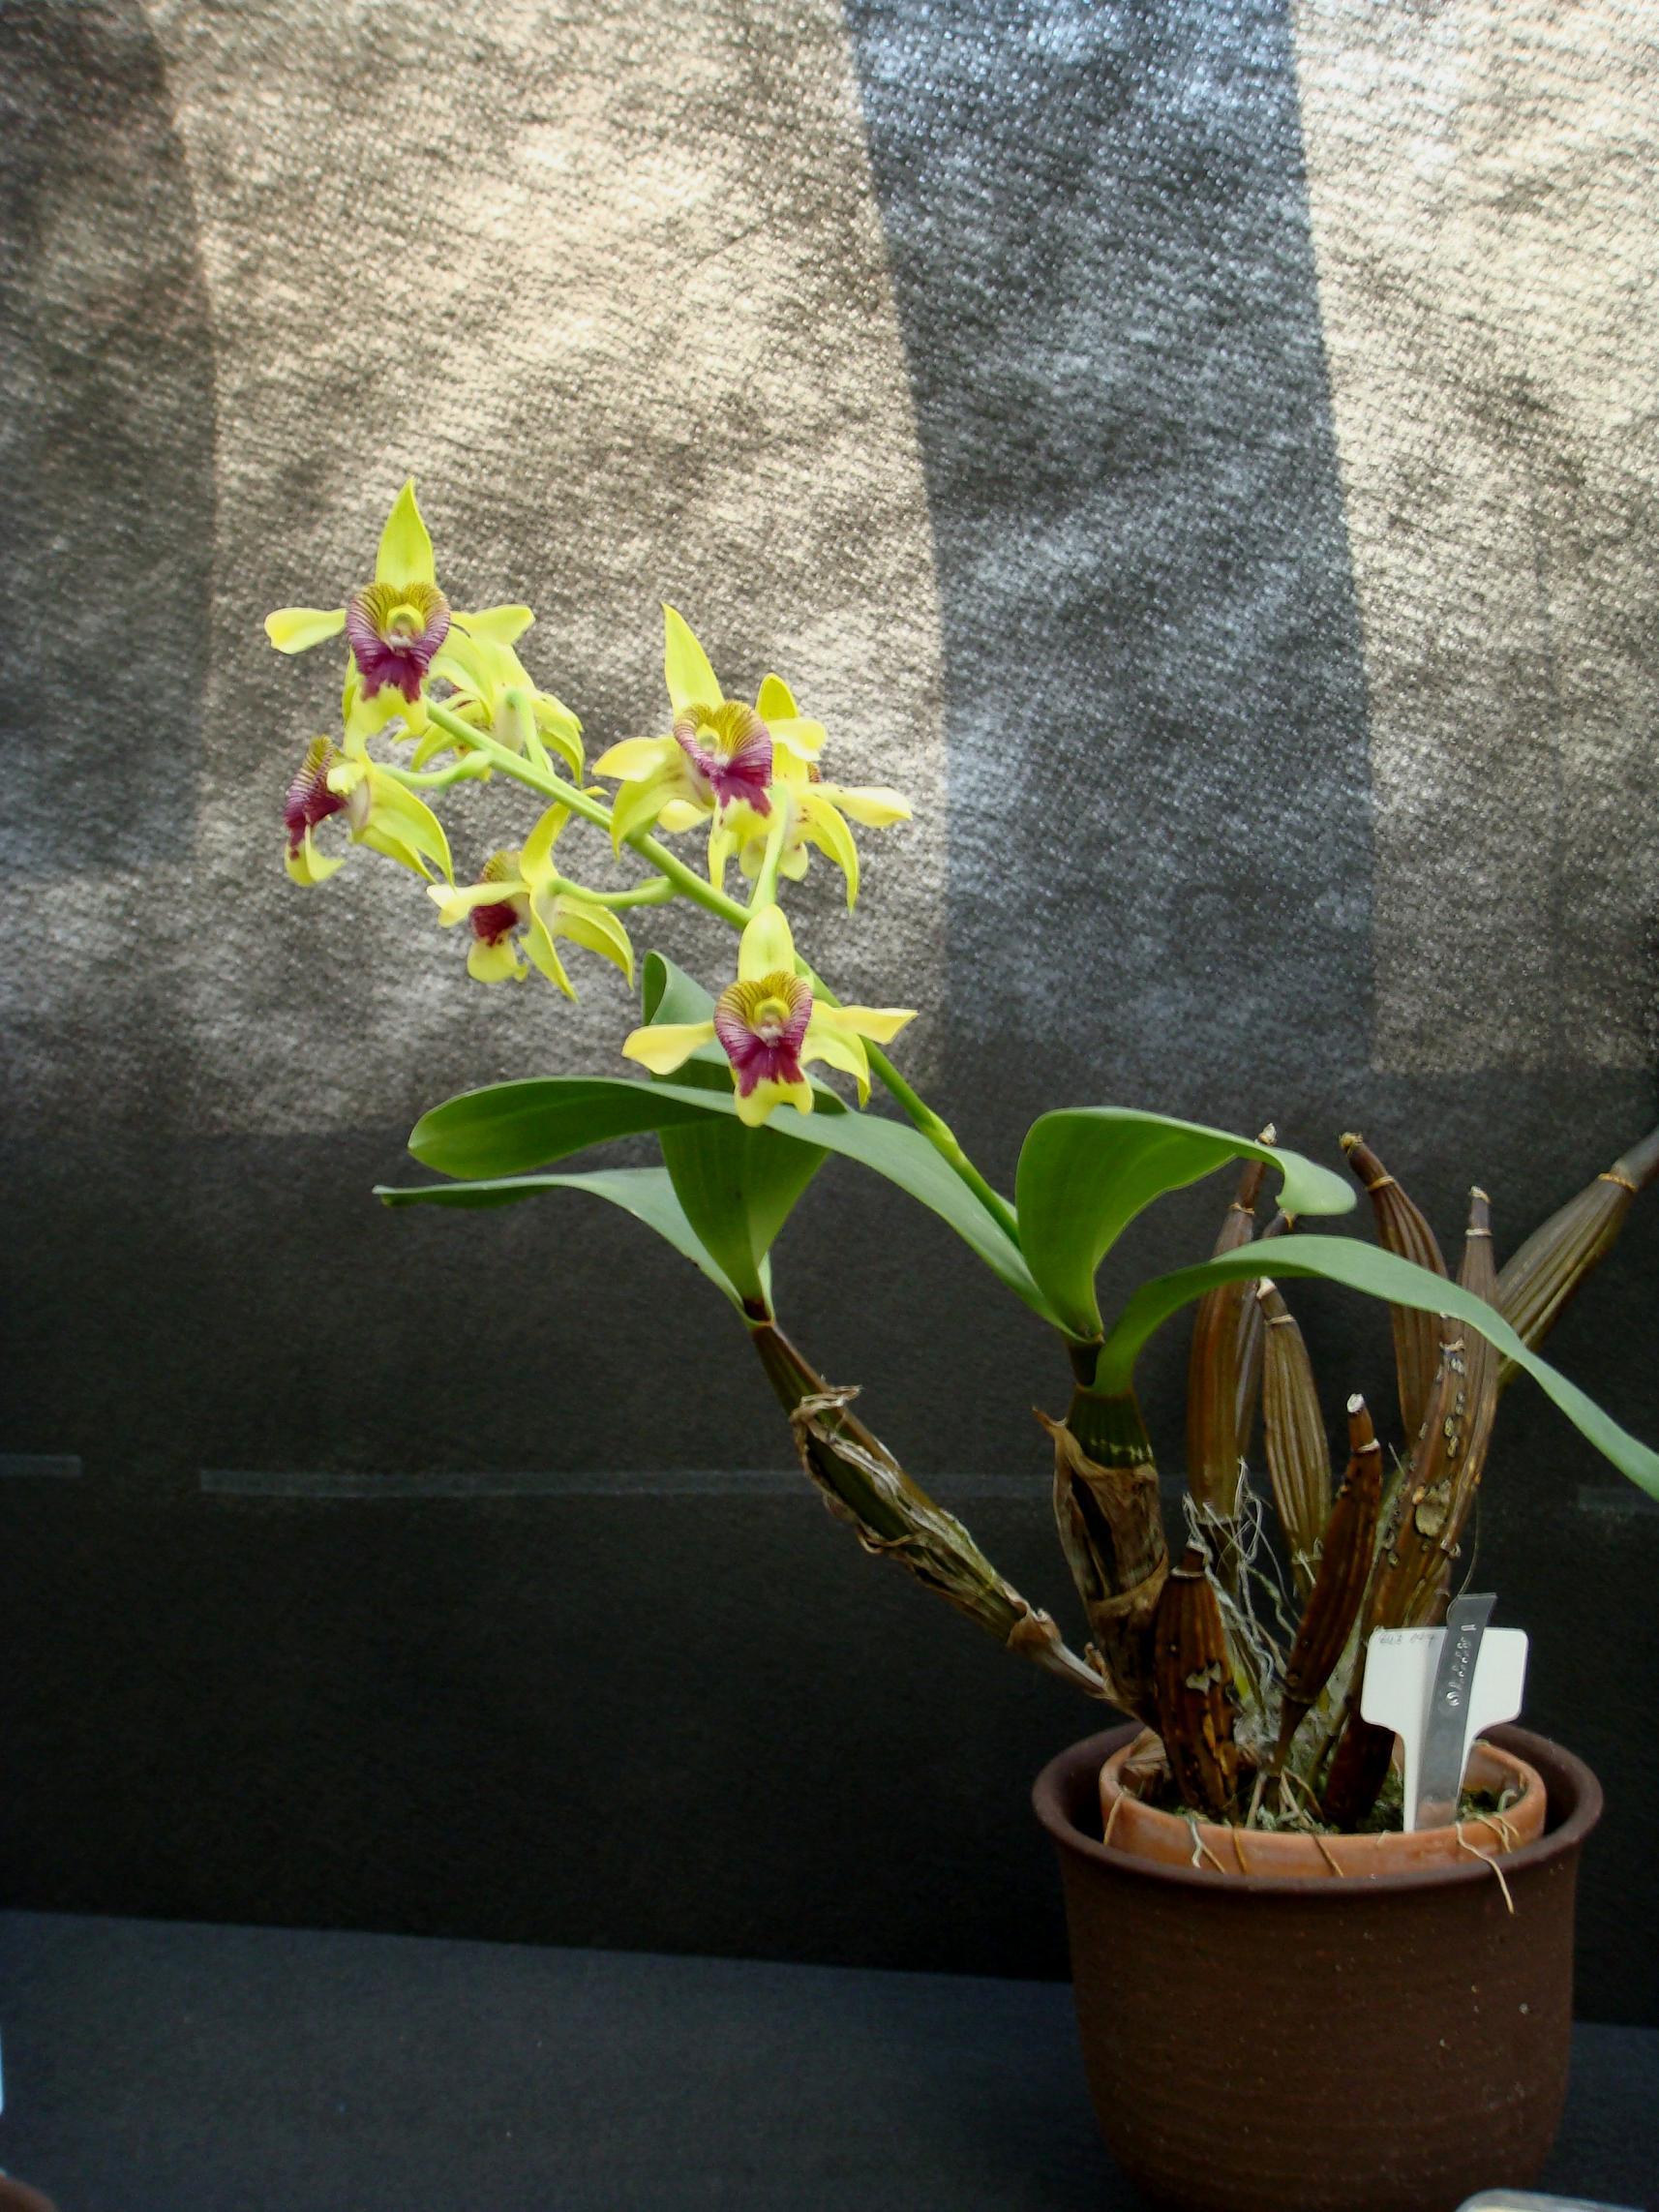 http://orchids.la.coocan.jp/Dendrobium/Dendrobium%20shiraishii/DSC02811.JPG